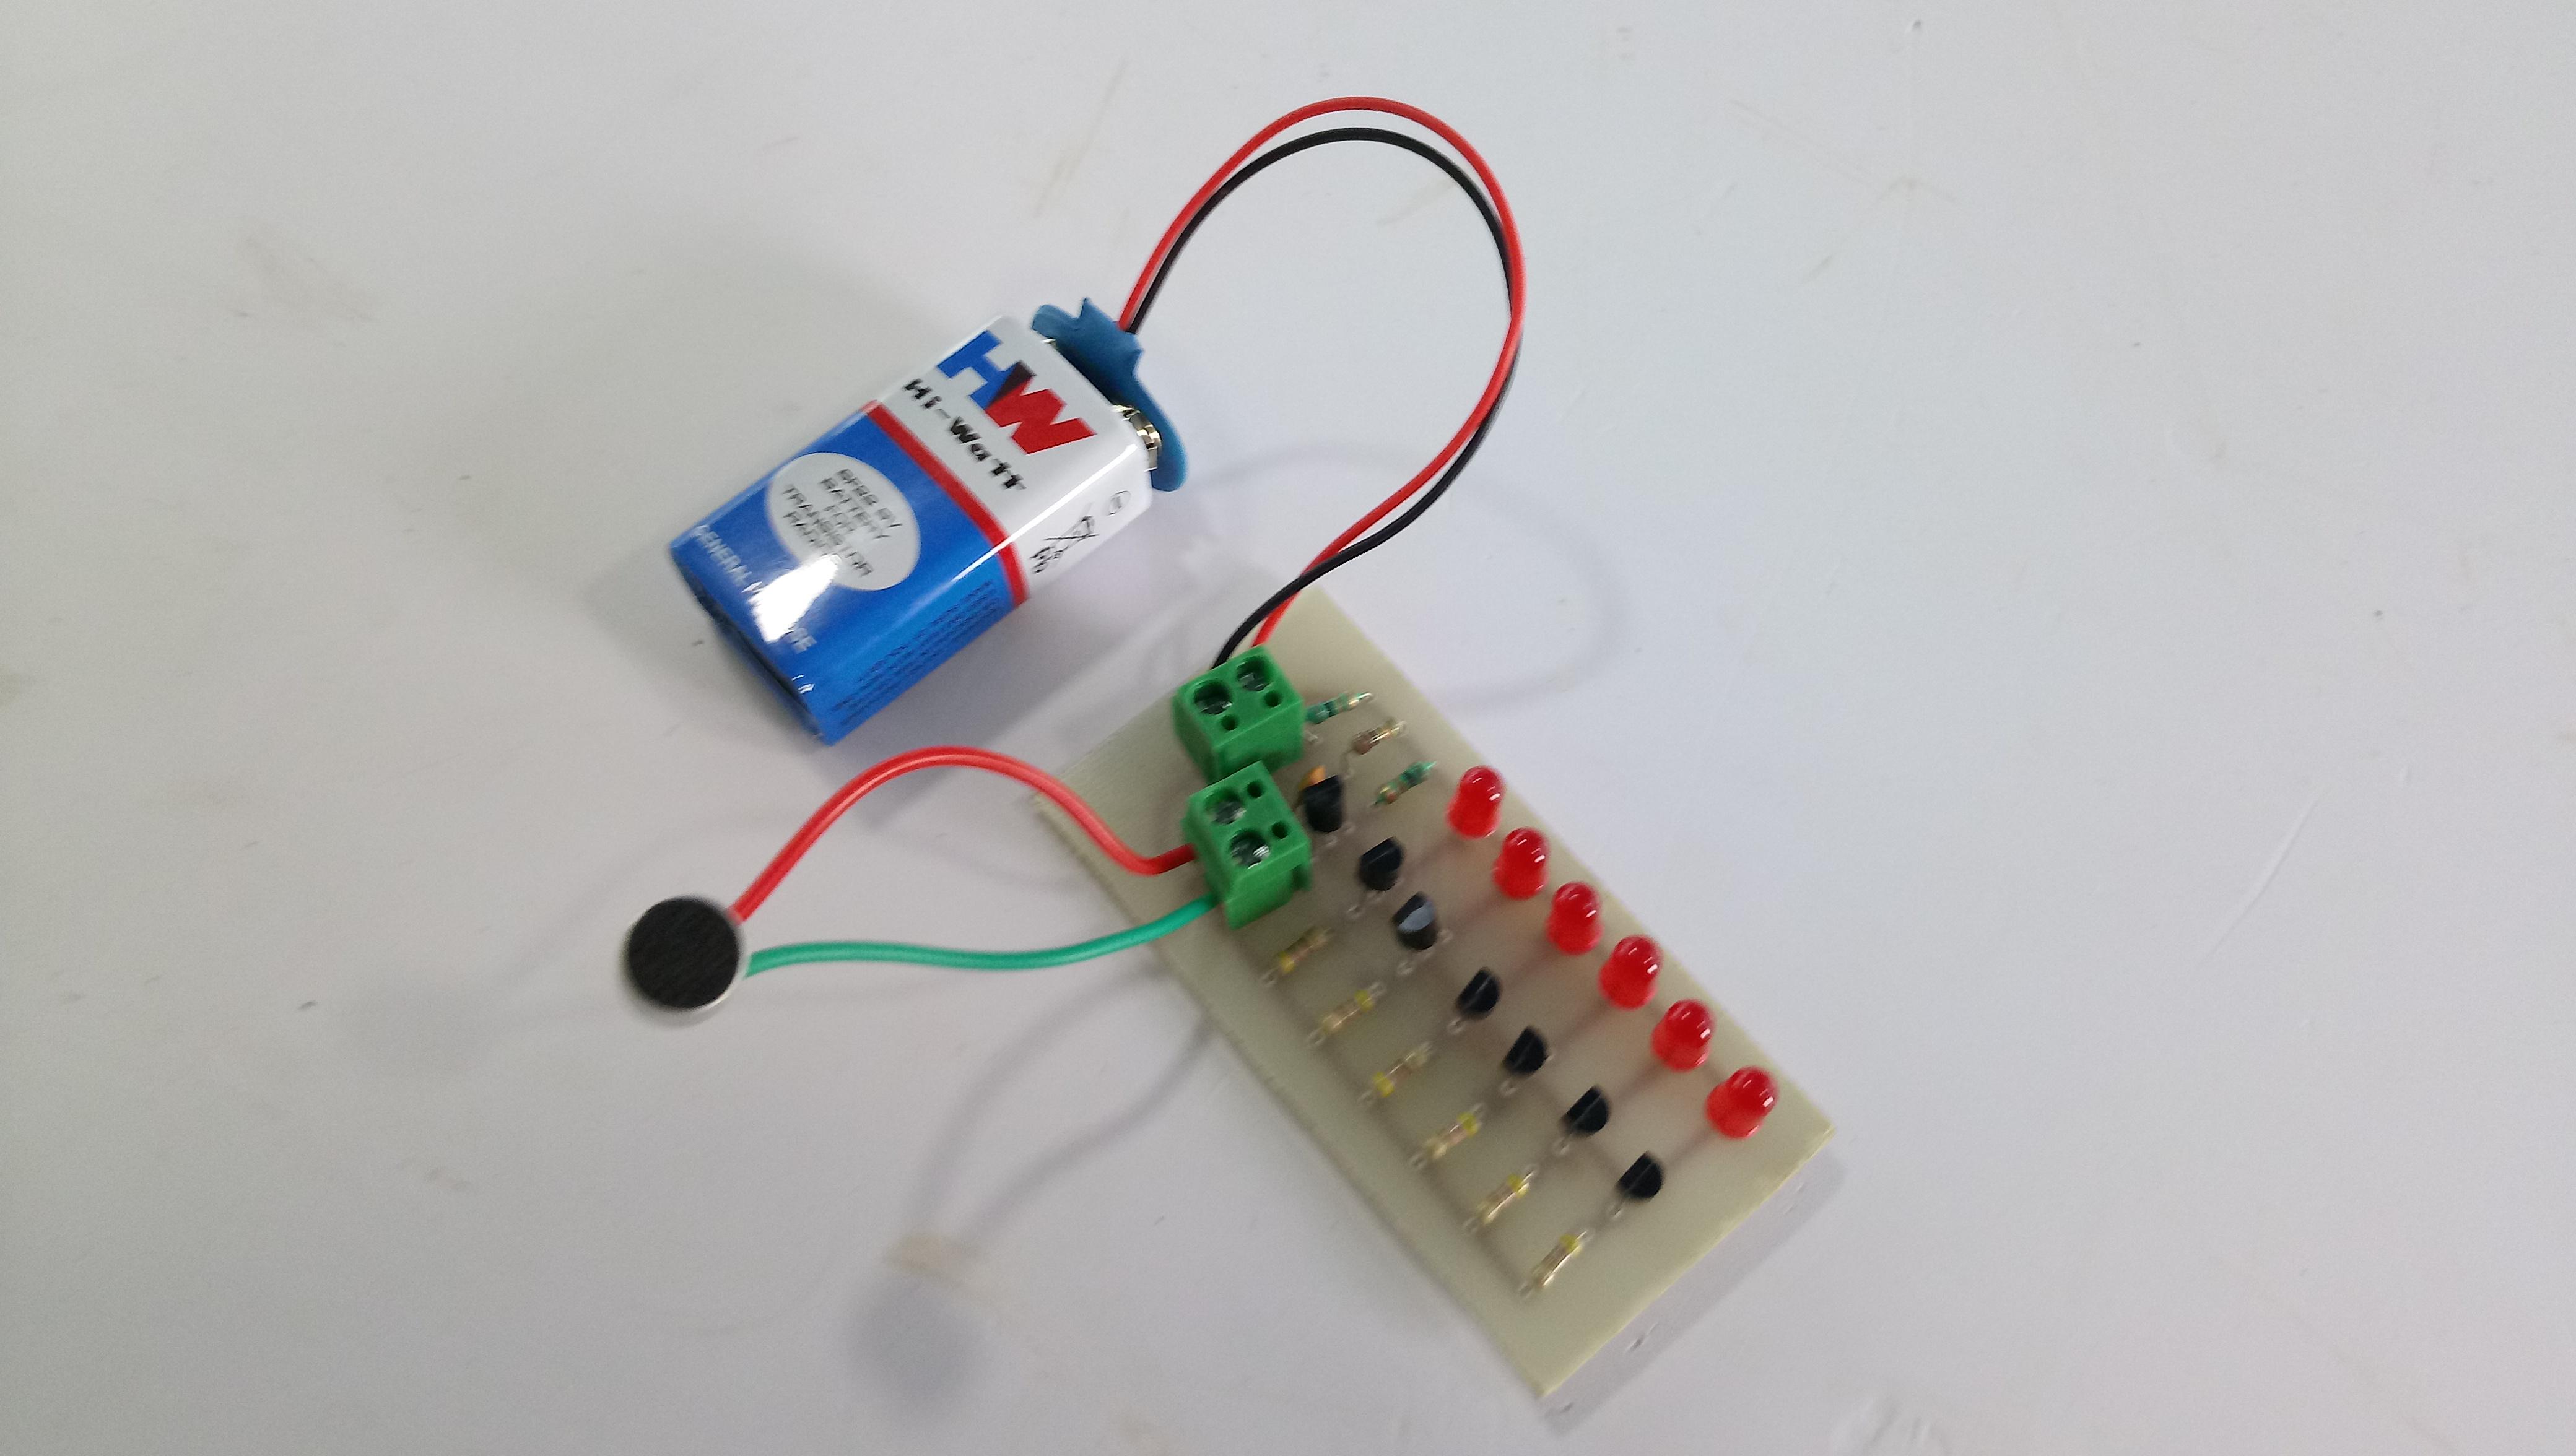 MUSIC REACTIVE FLASH LIGHT LED USING MICROPHONE